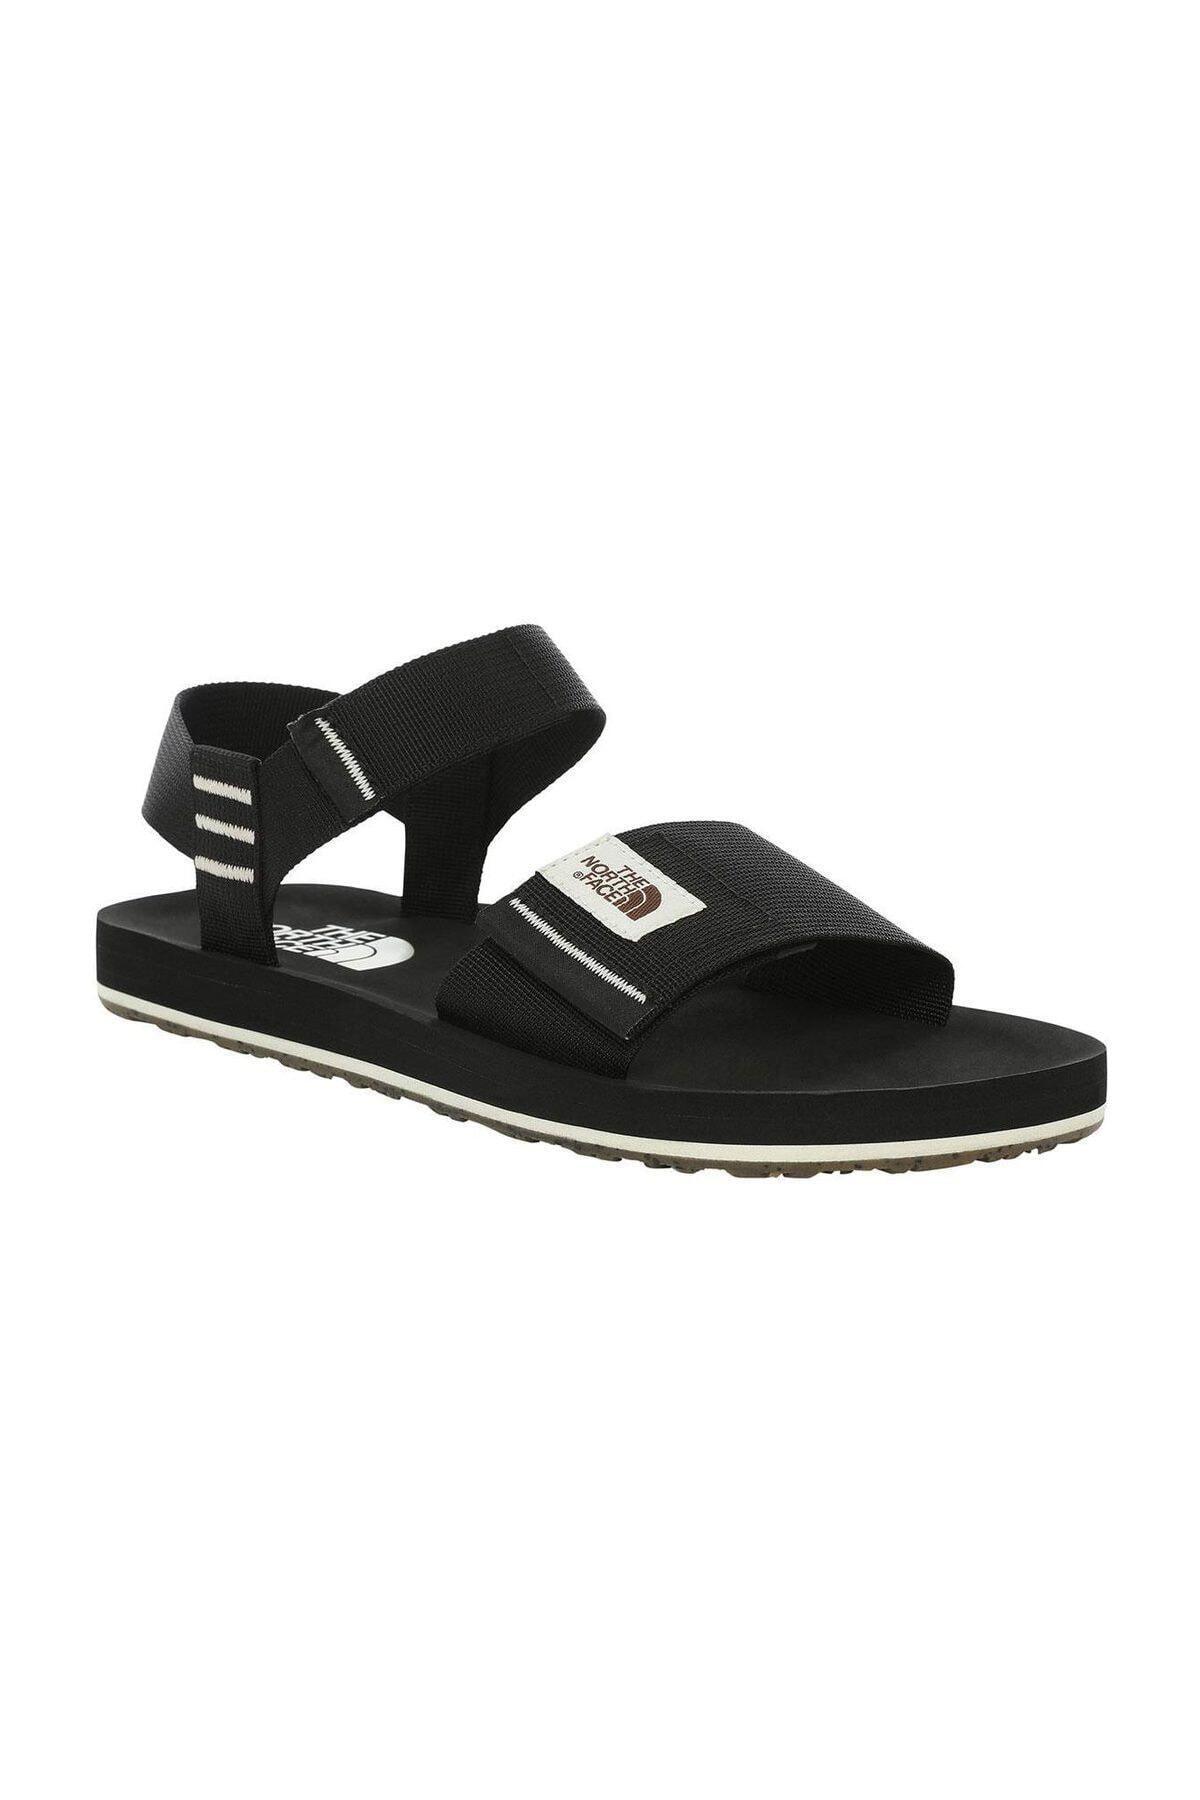 Skeena Kadın Sandalet - T946bflq6